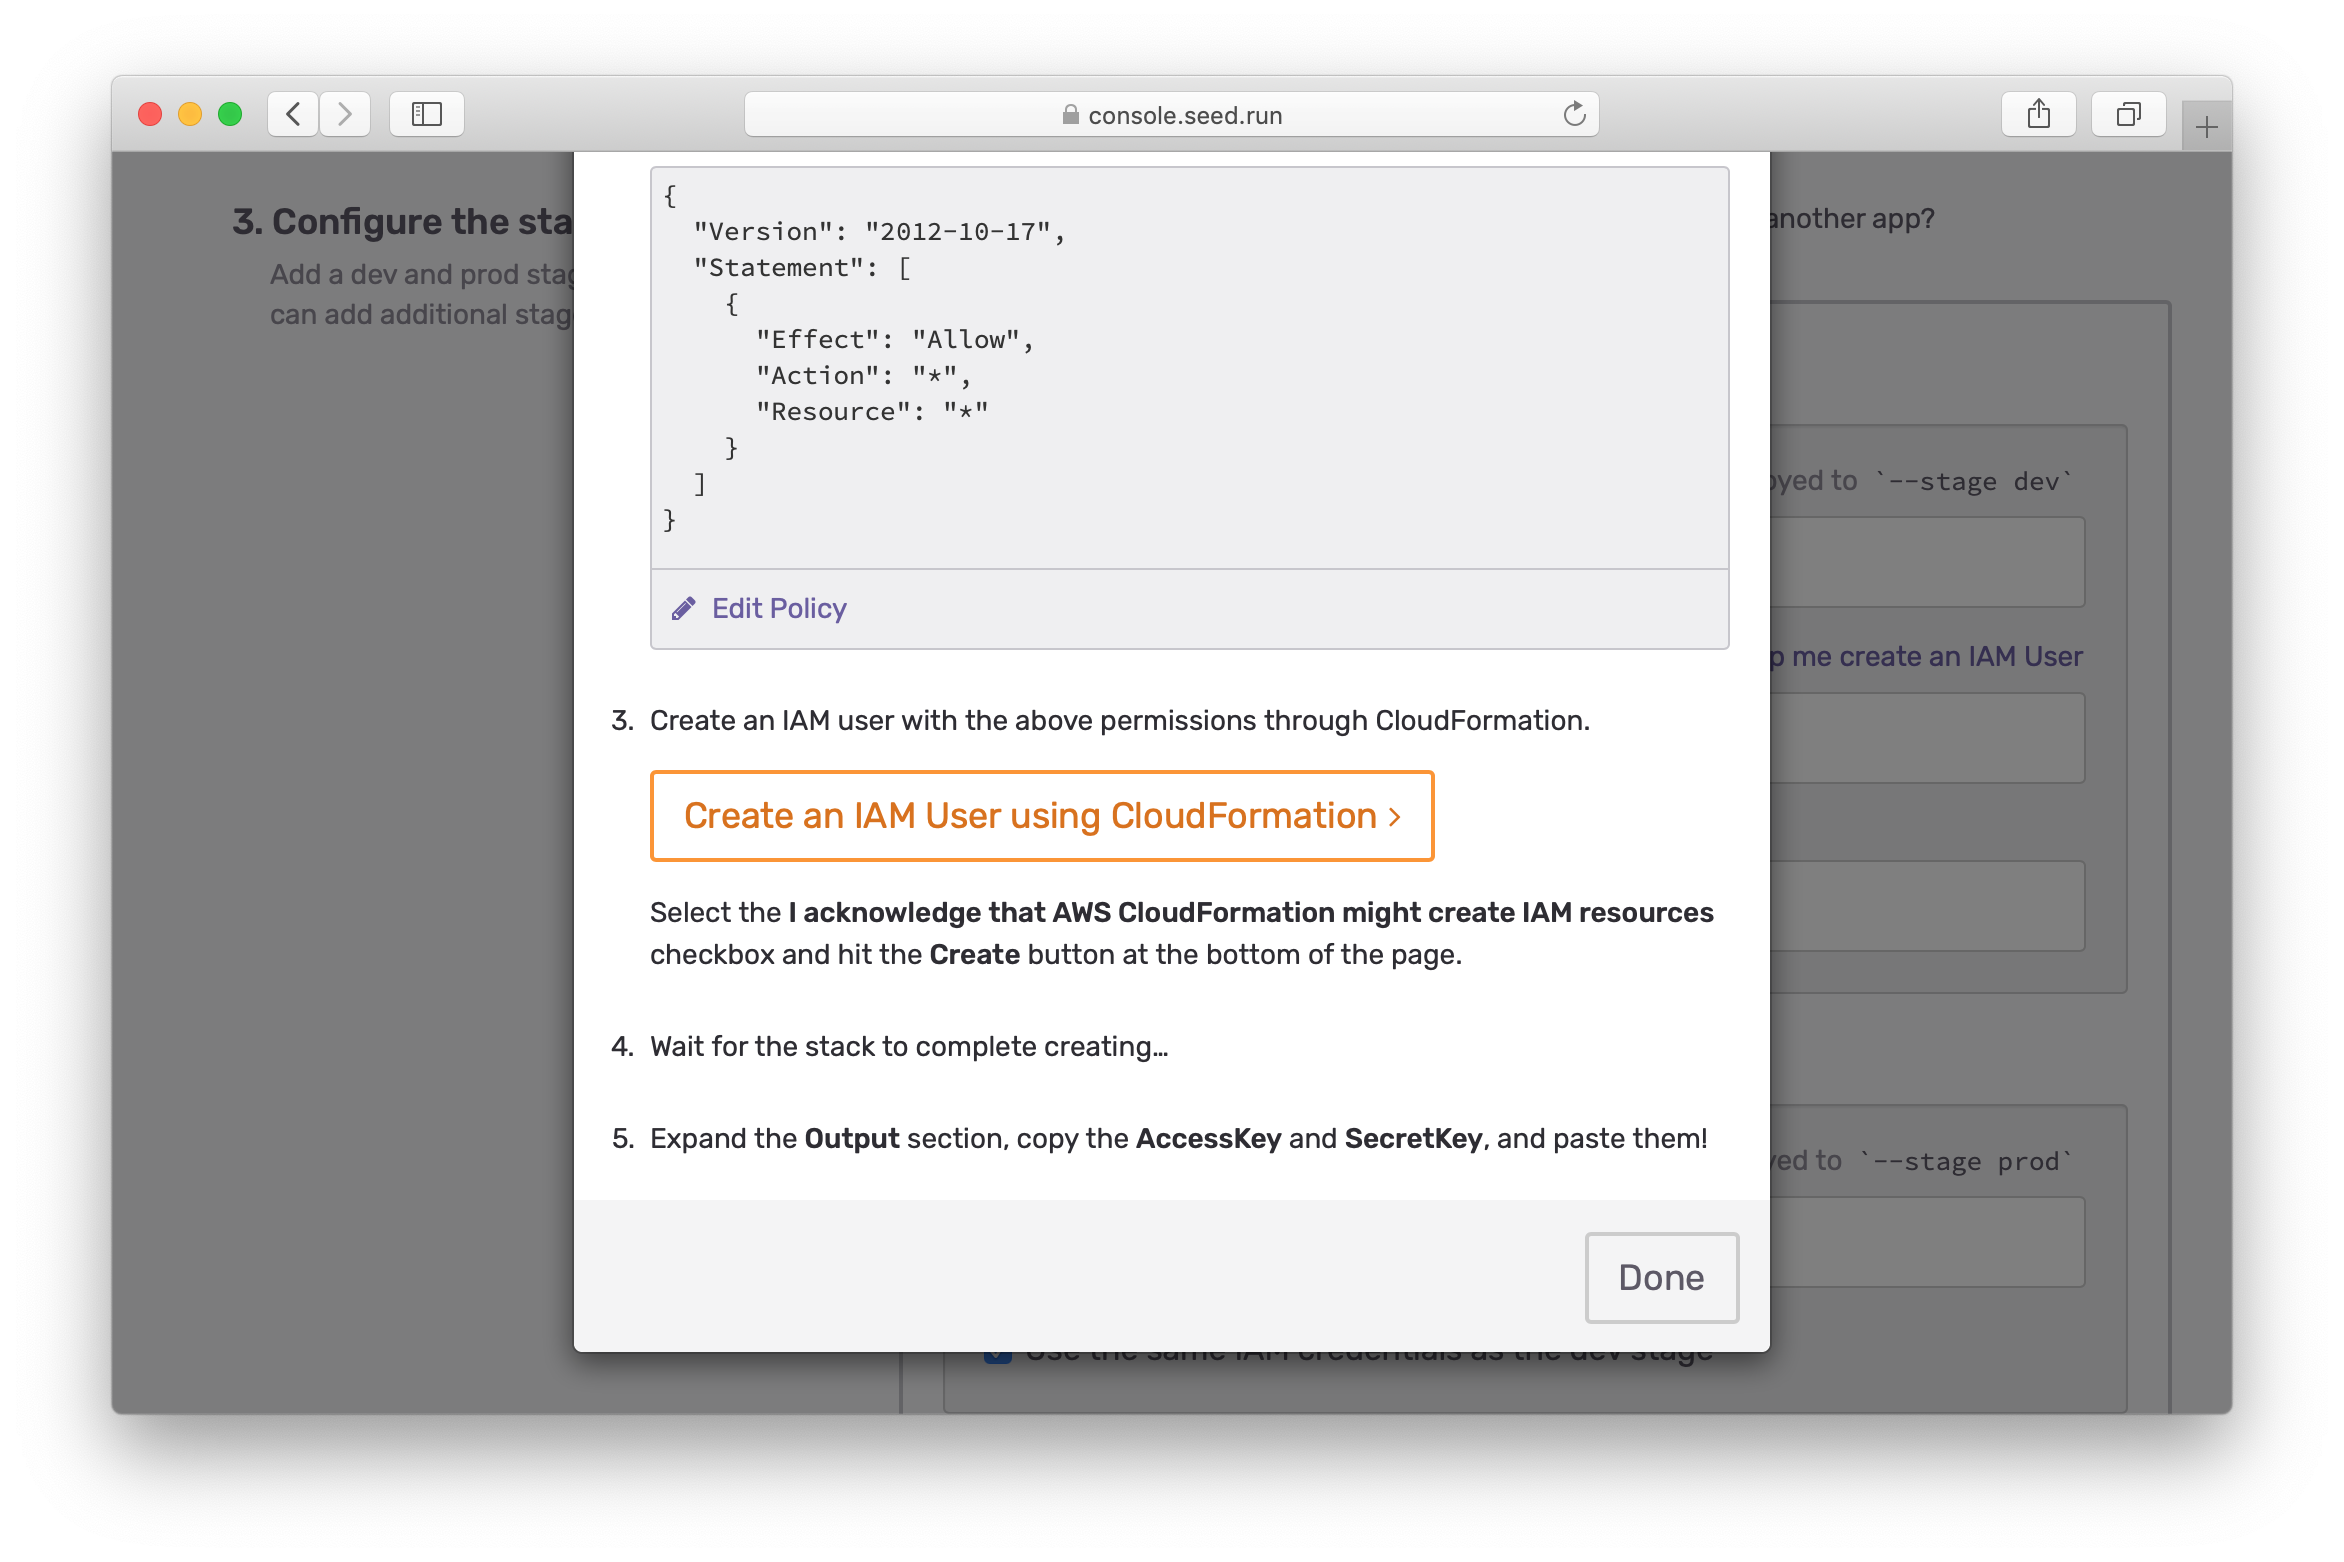 Click Create an IAM user using CloudFormation screenshot